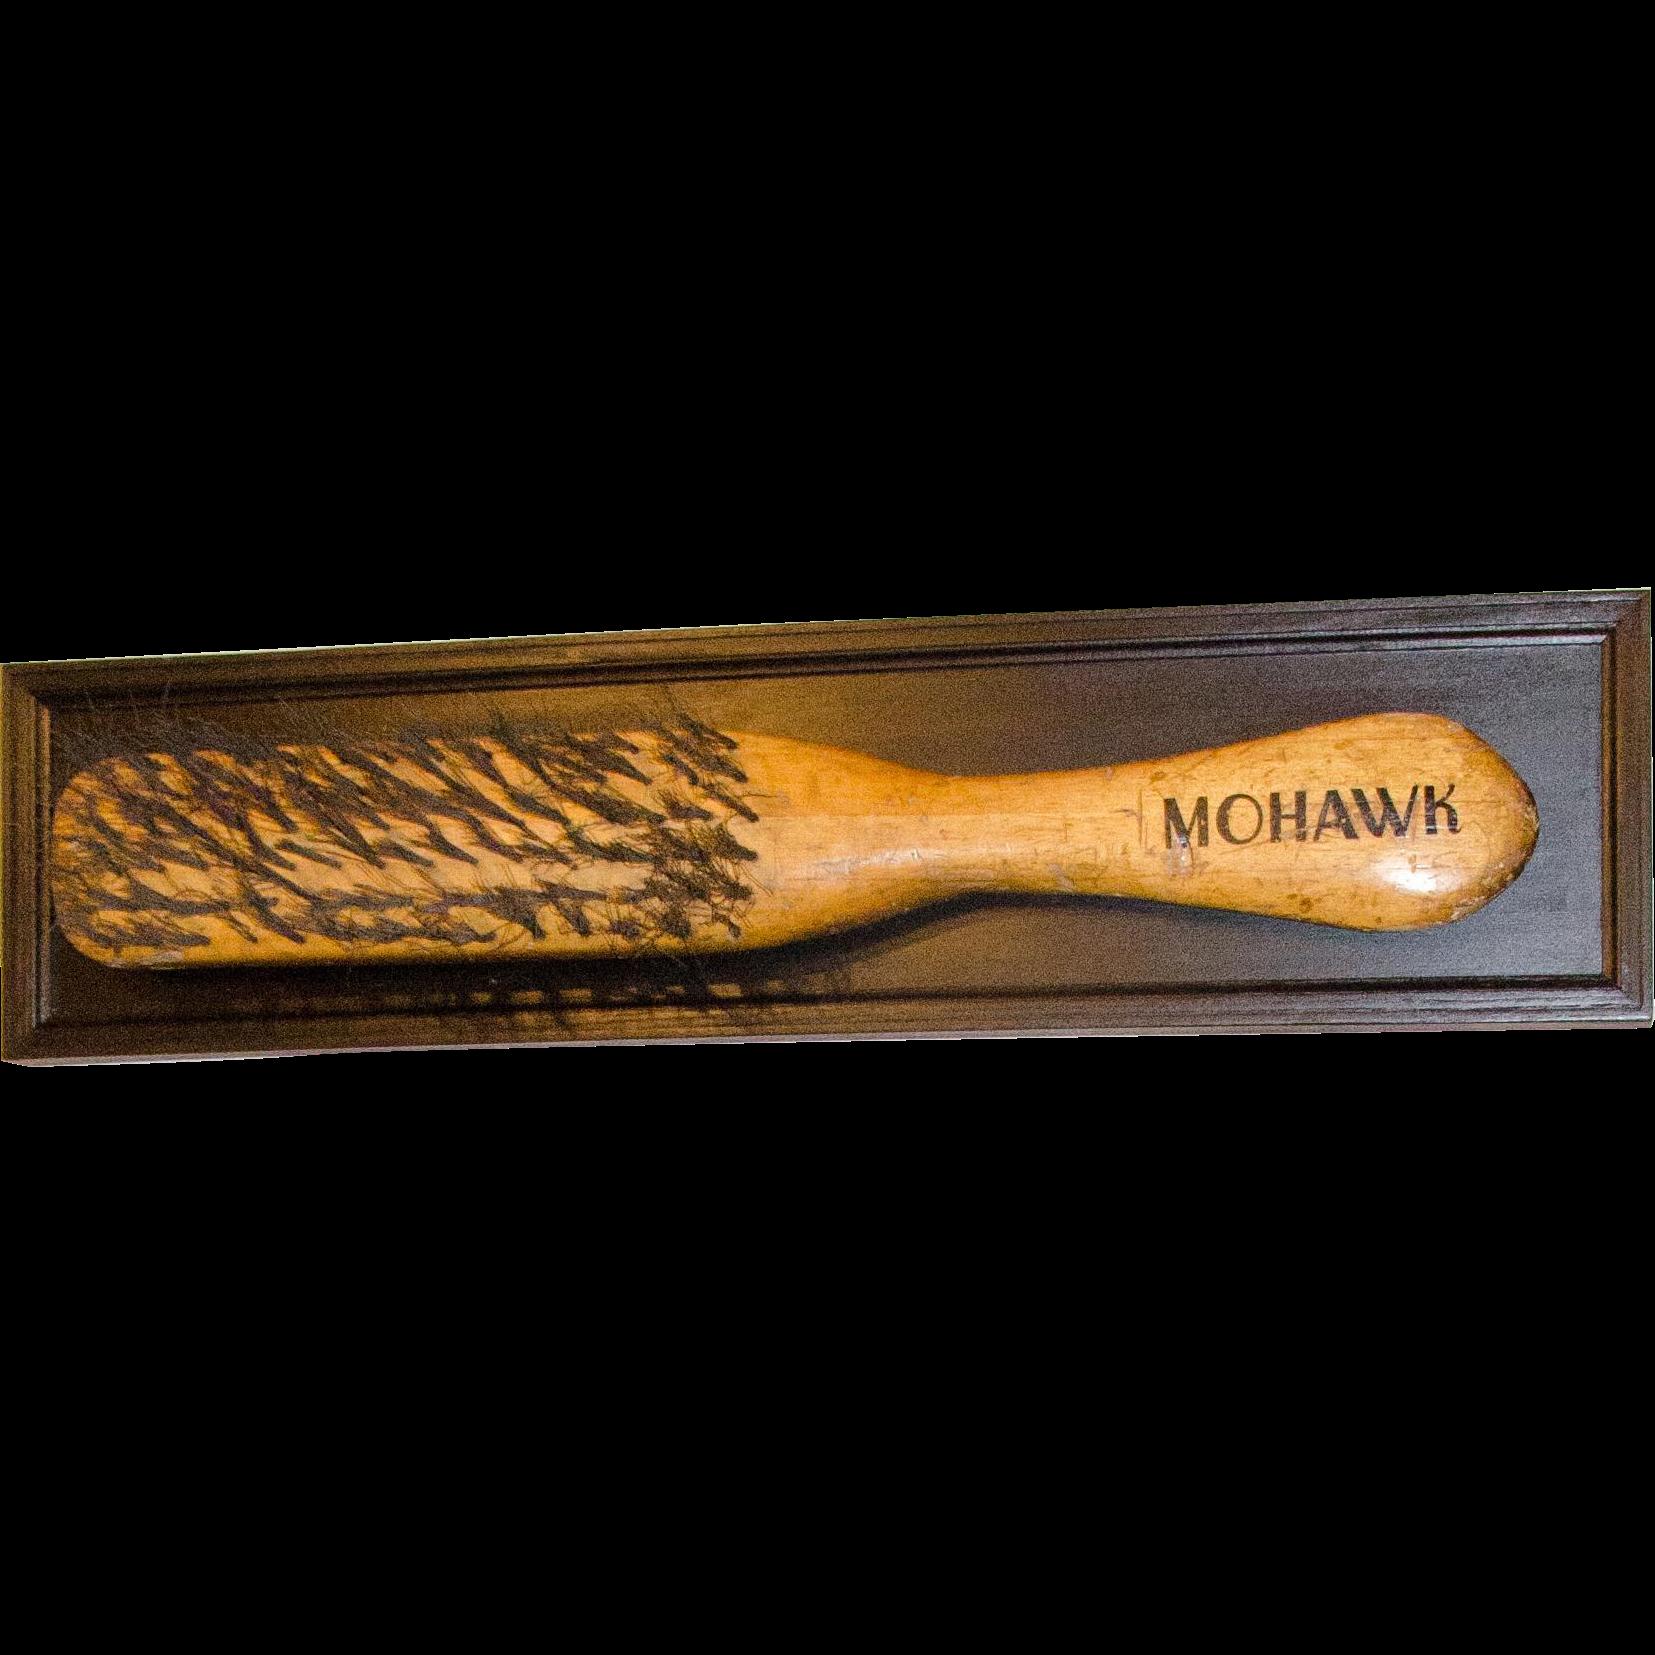 Mohawk Brush Trade Sign